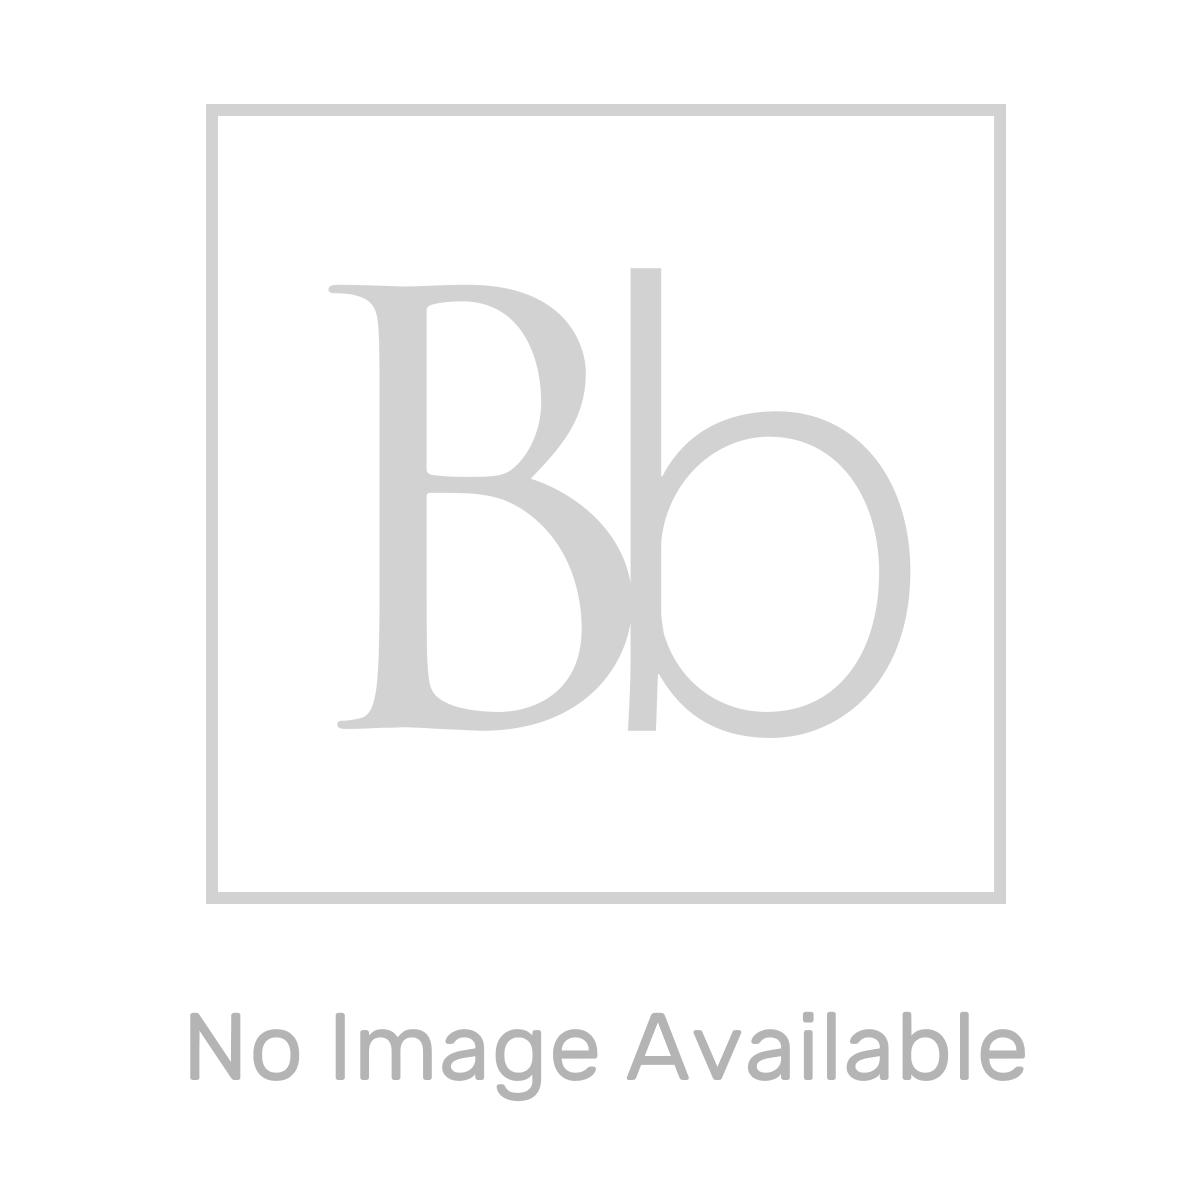 Tavistock Vitoria Close Coupled Toilet - Natural Oak Seat in Situation